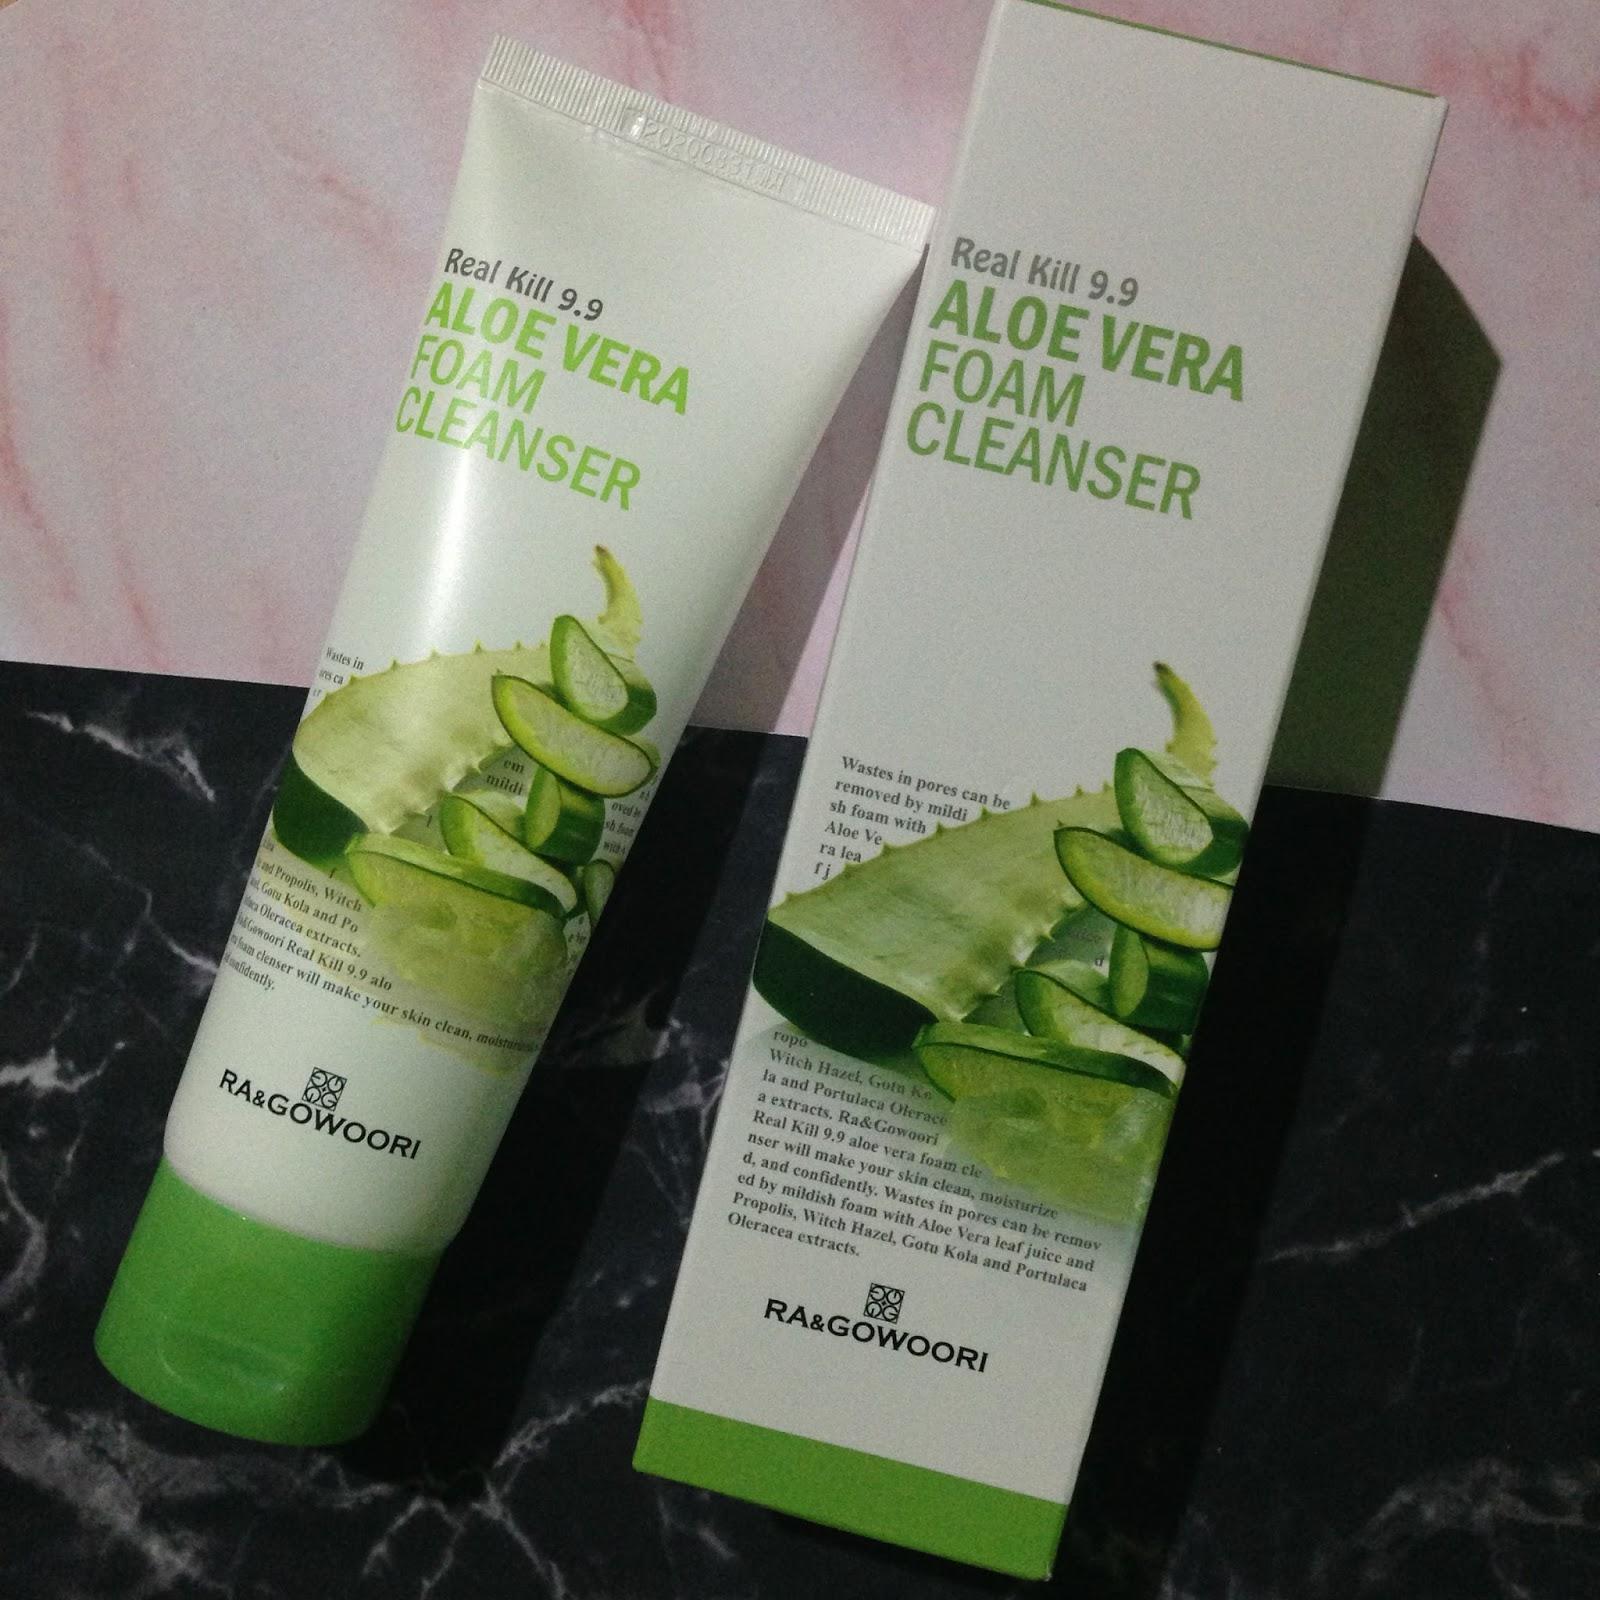 Sữa Rửa Mặt nha đam  Real Kill 9.9 Green Tea Foam Cleanser Hàn Quốc 120ml tốt nhất